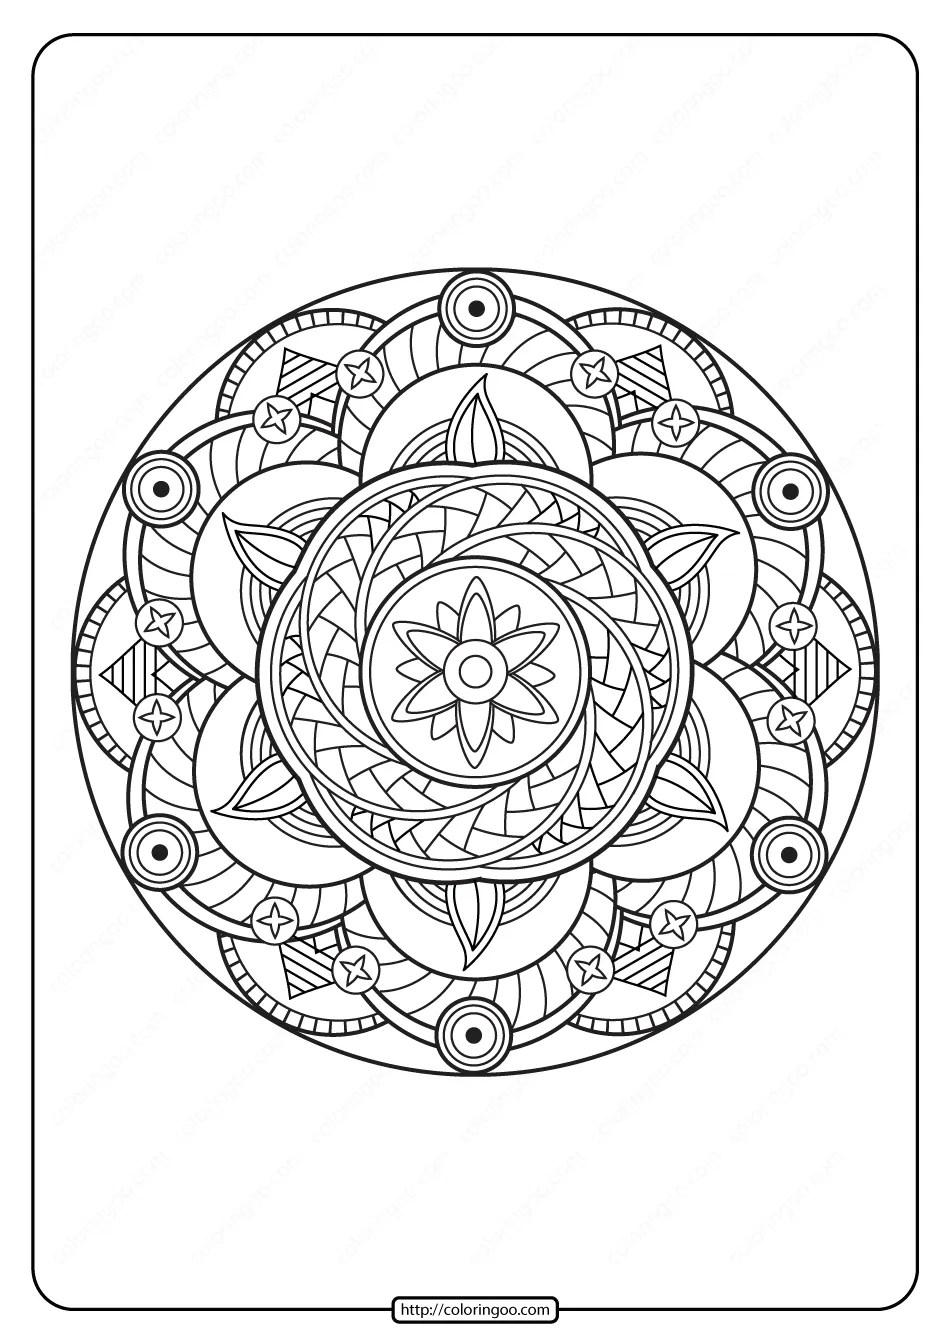 Free Printable Adult Floral Mandala Coloring Page 62